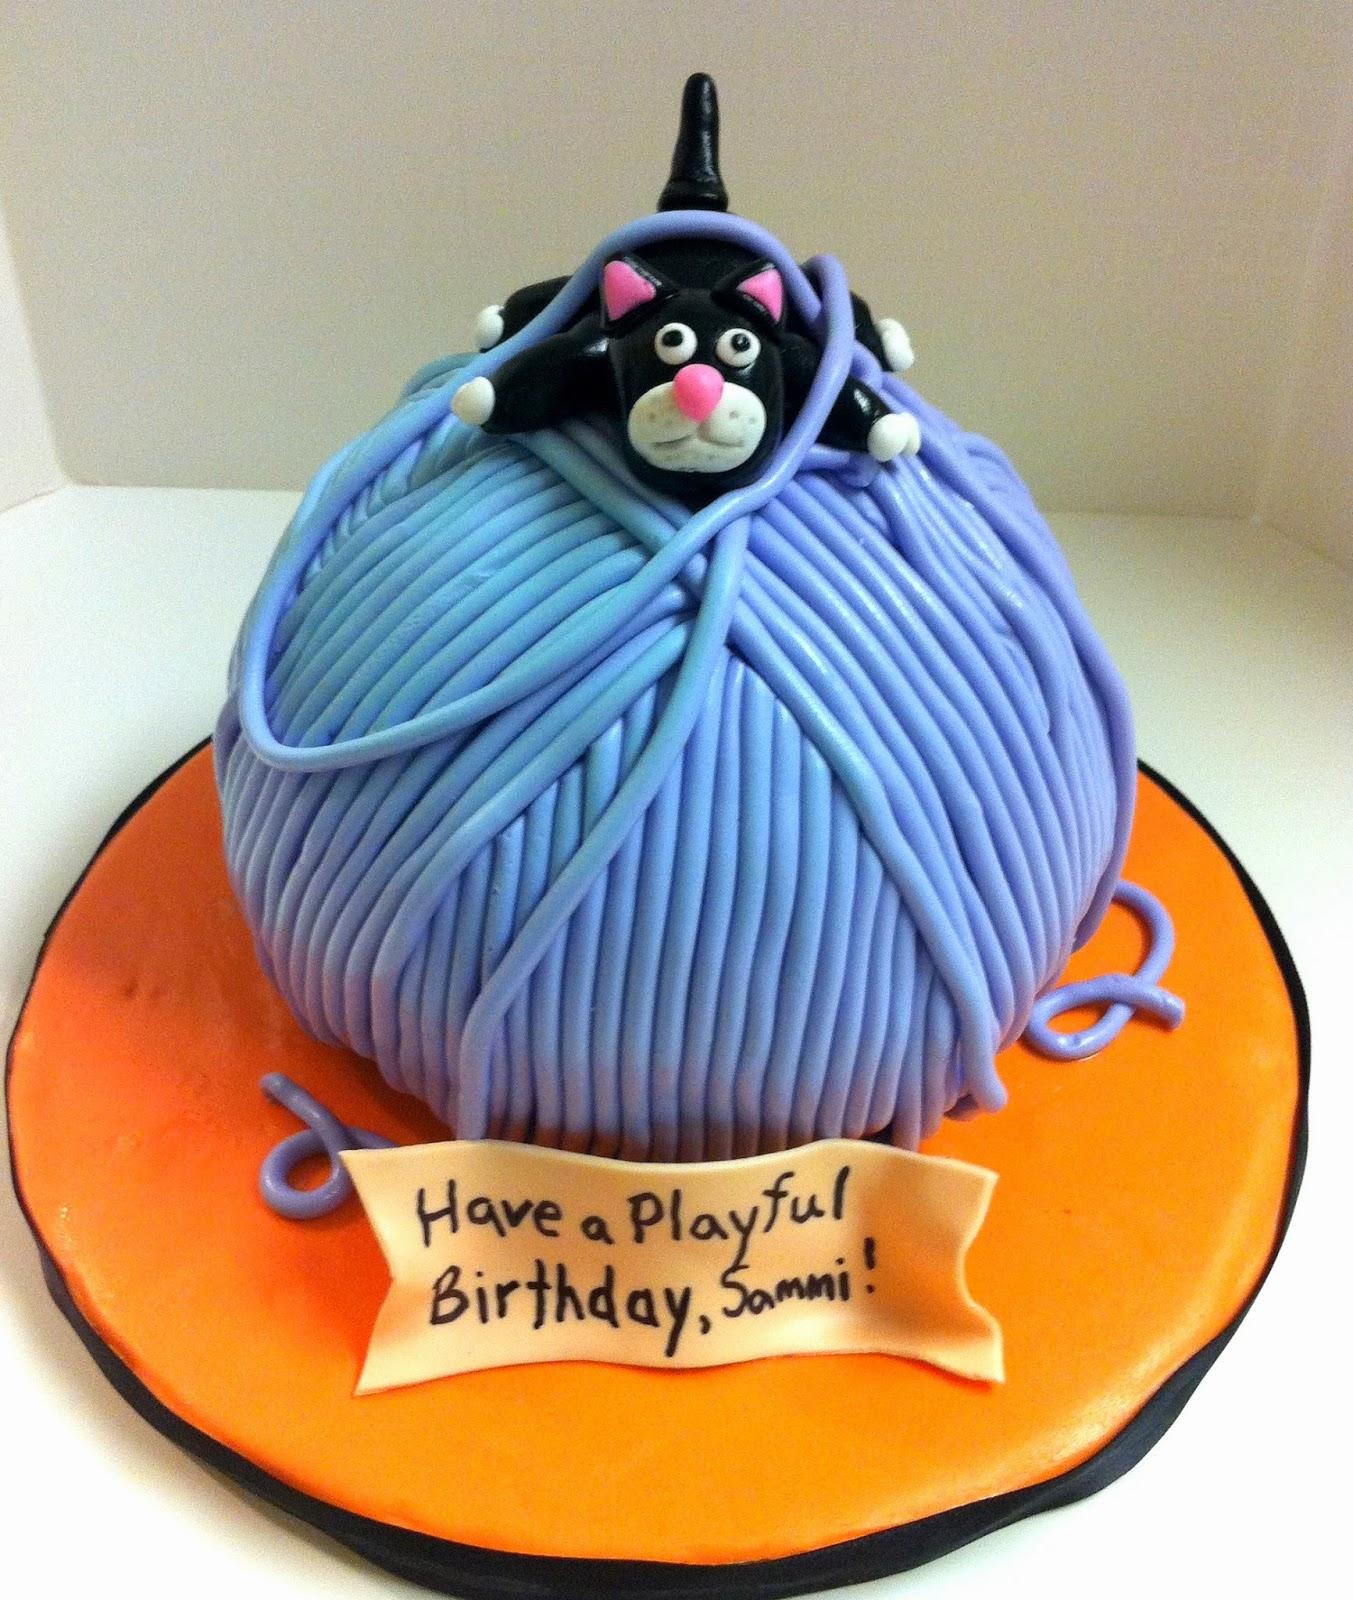 Hogans Sweet Art Playful Kitty Cake